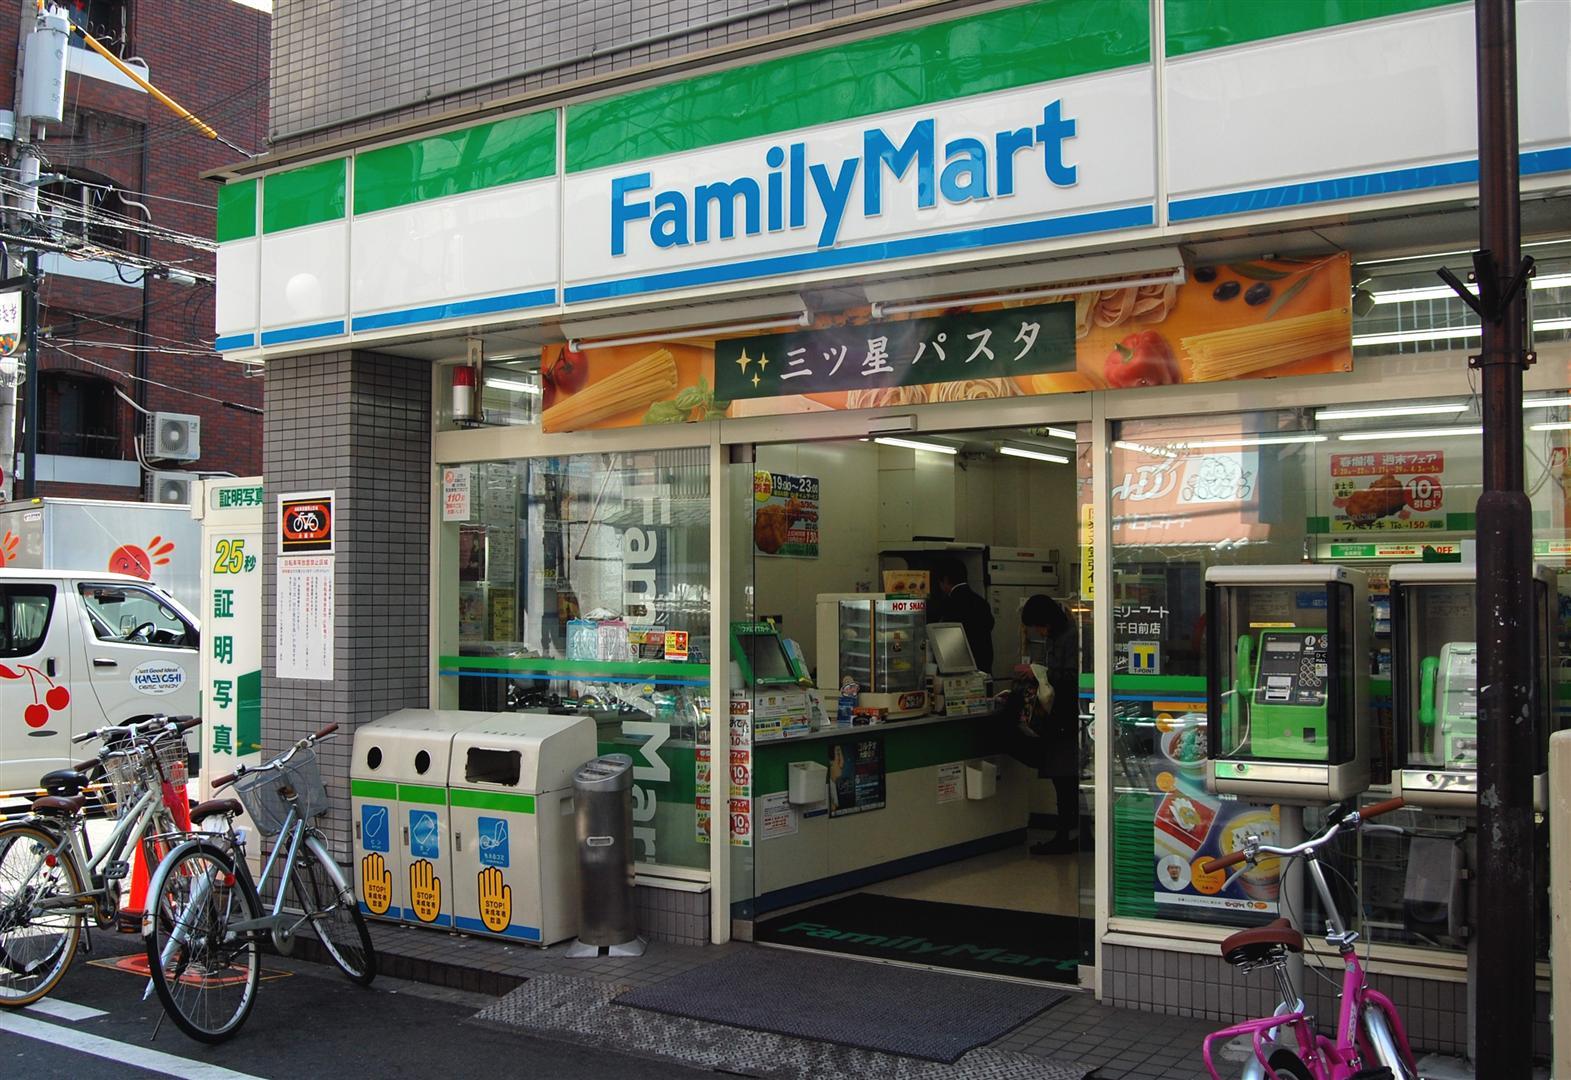 FamilyMart-Convenience-store